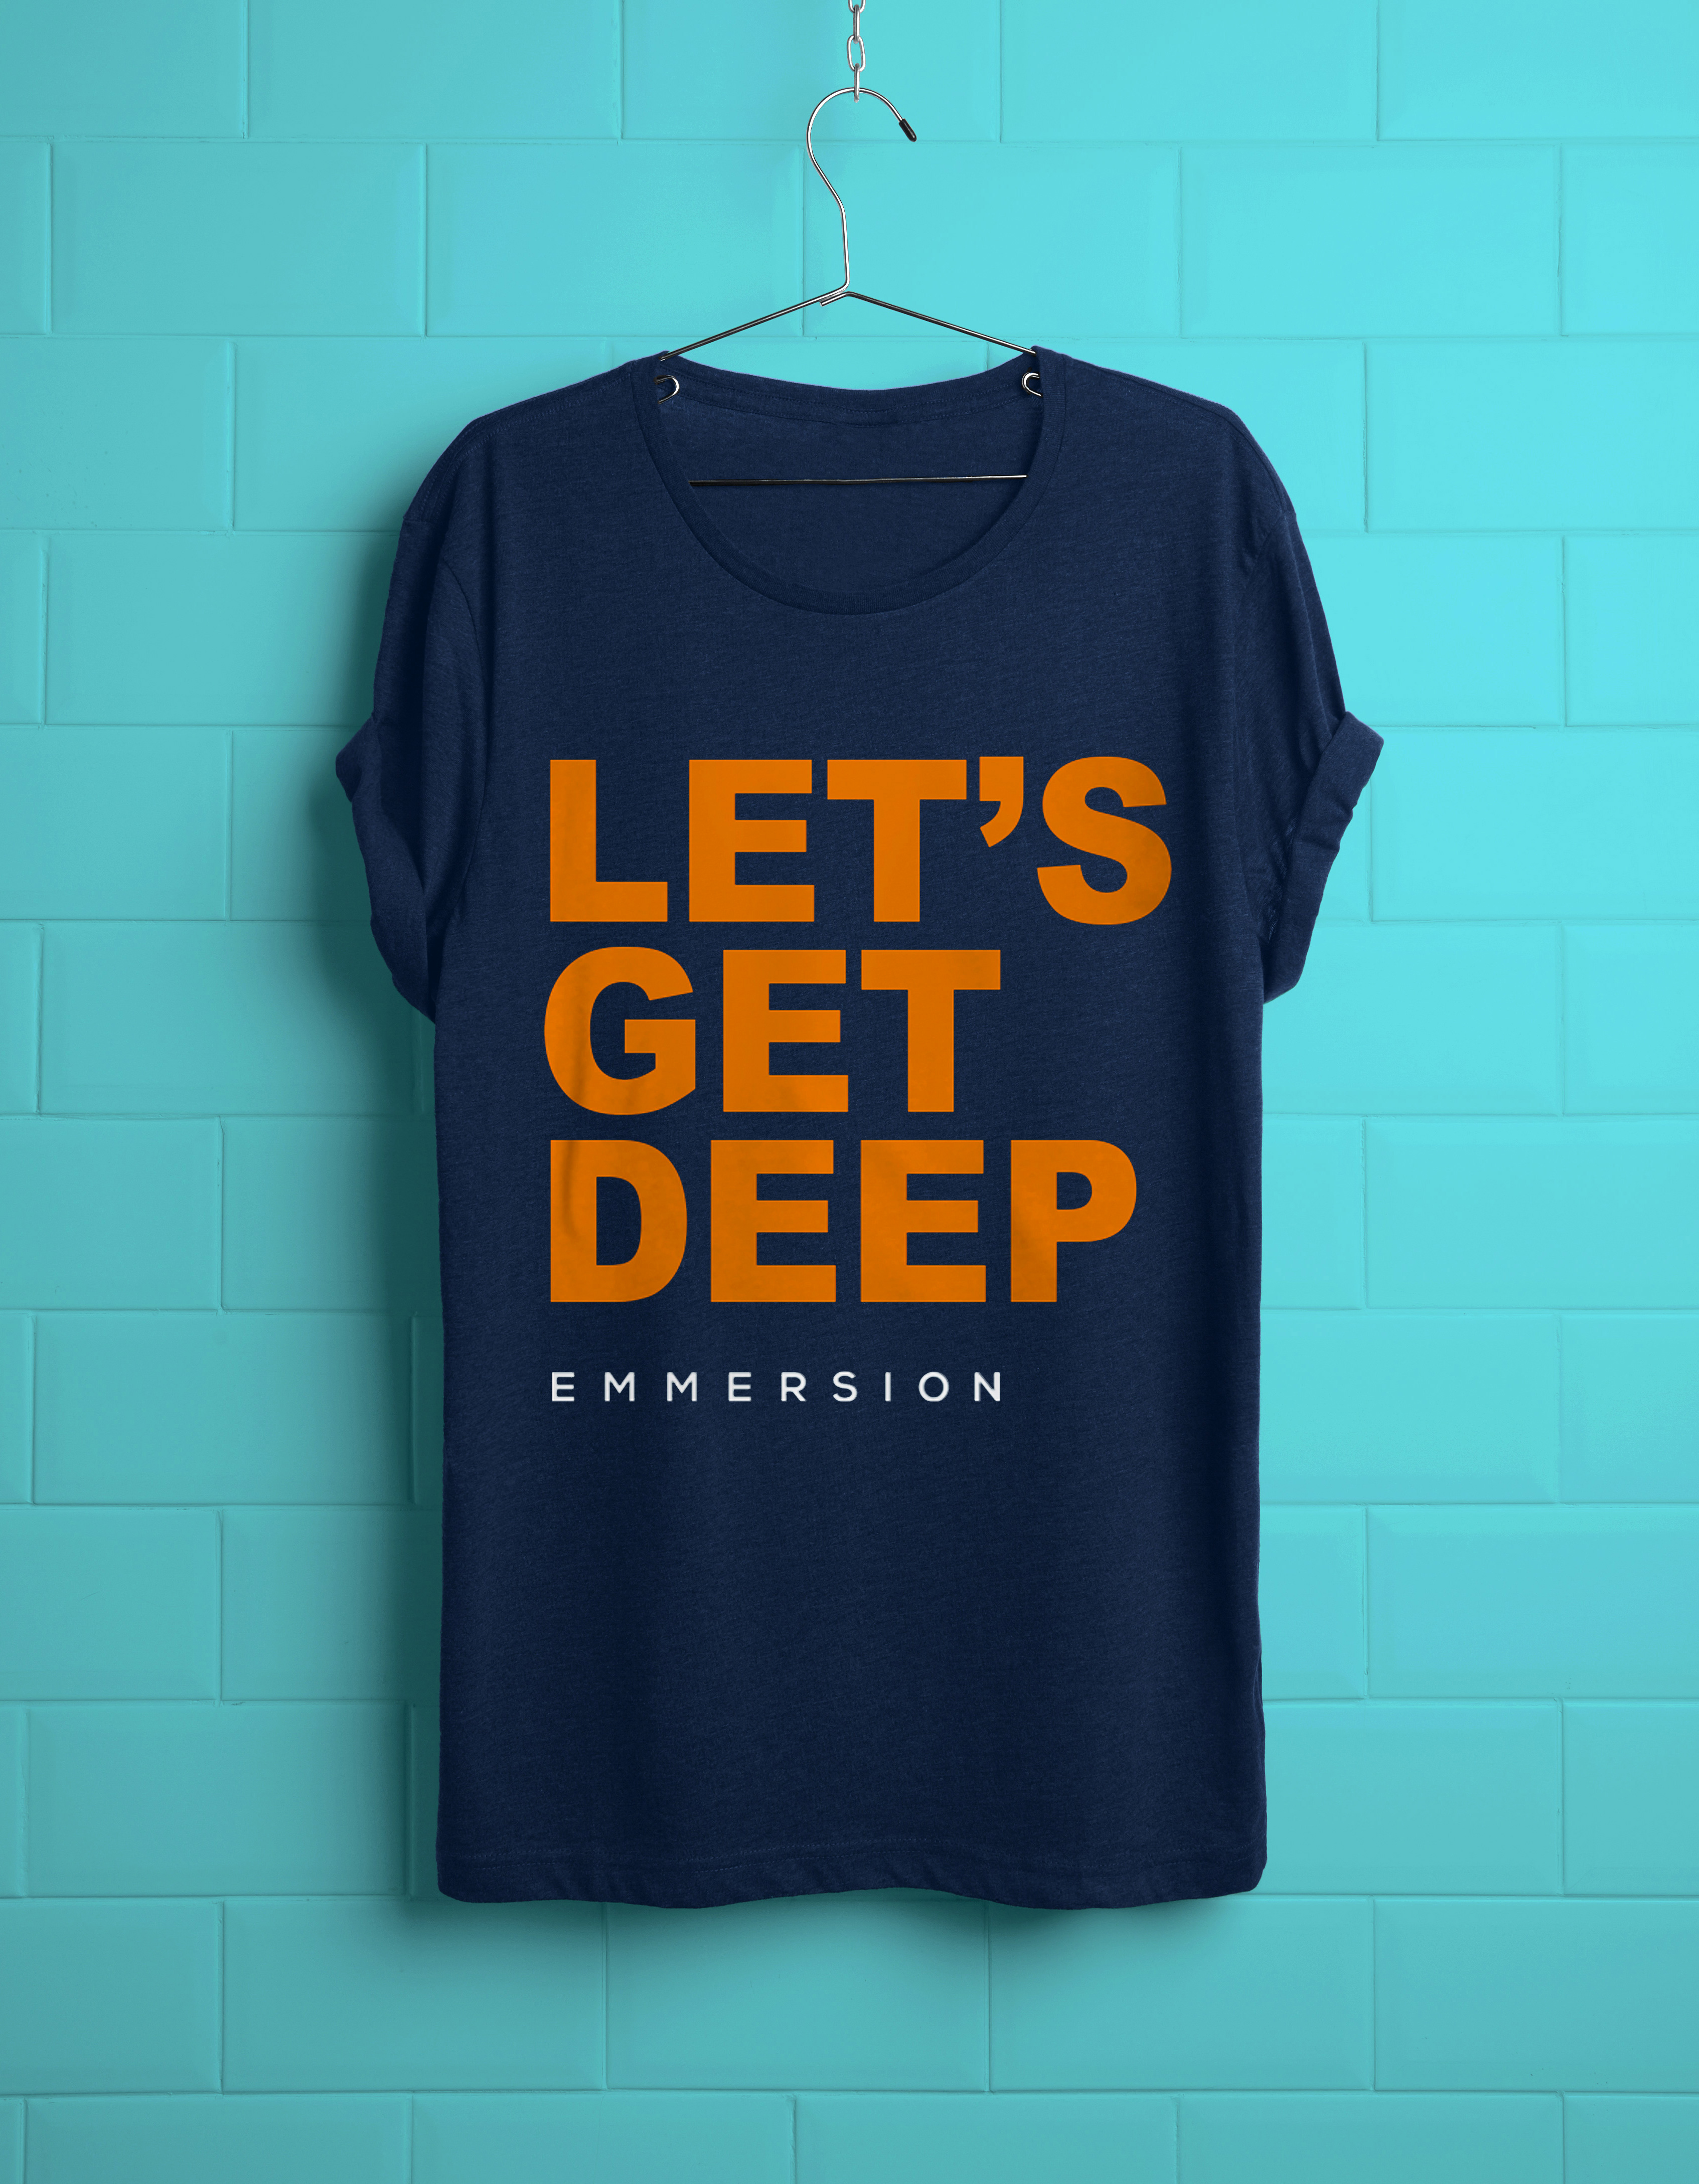 8_Realistic-T-shirt-PSD_emmersion_croppedorange